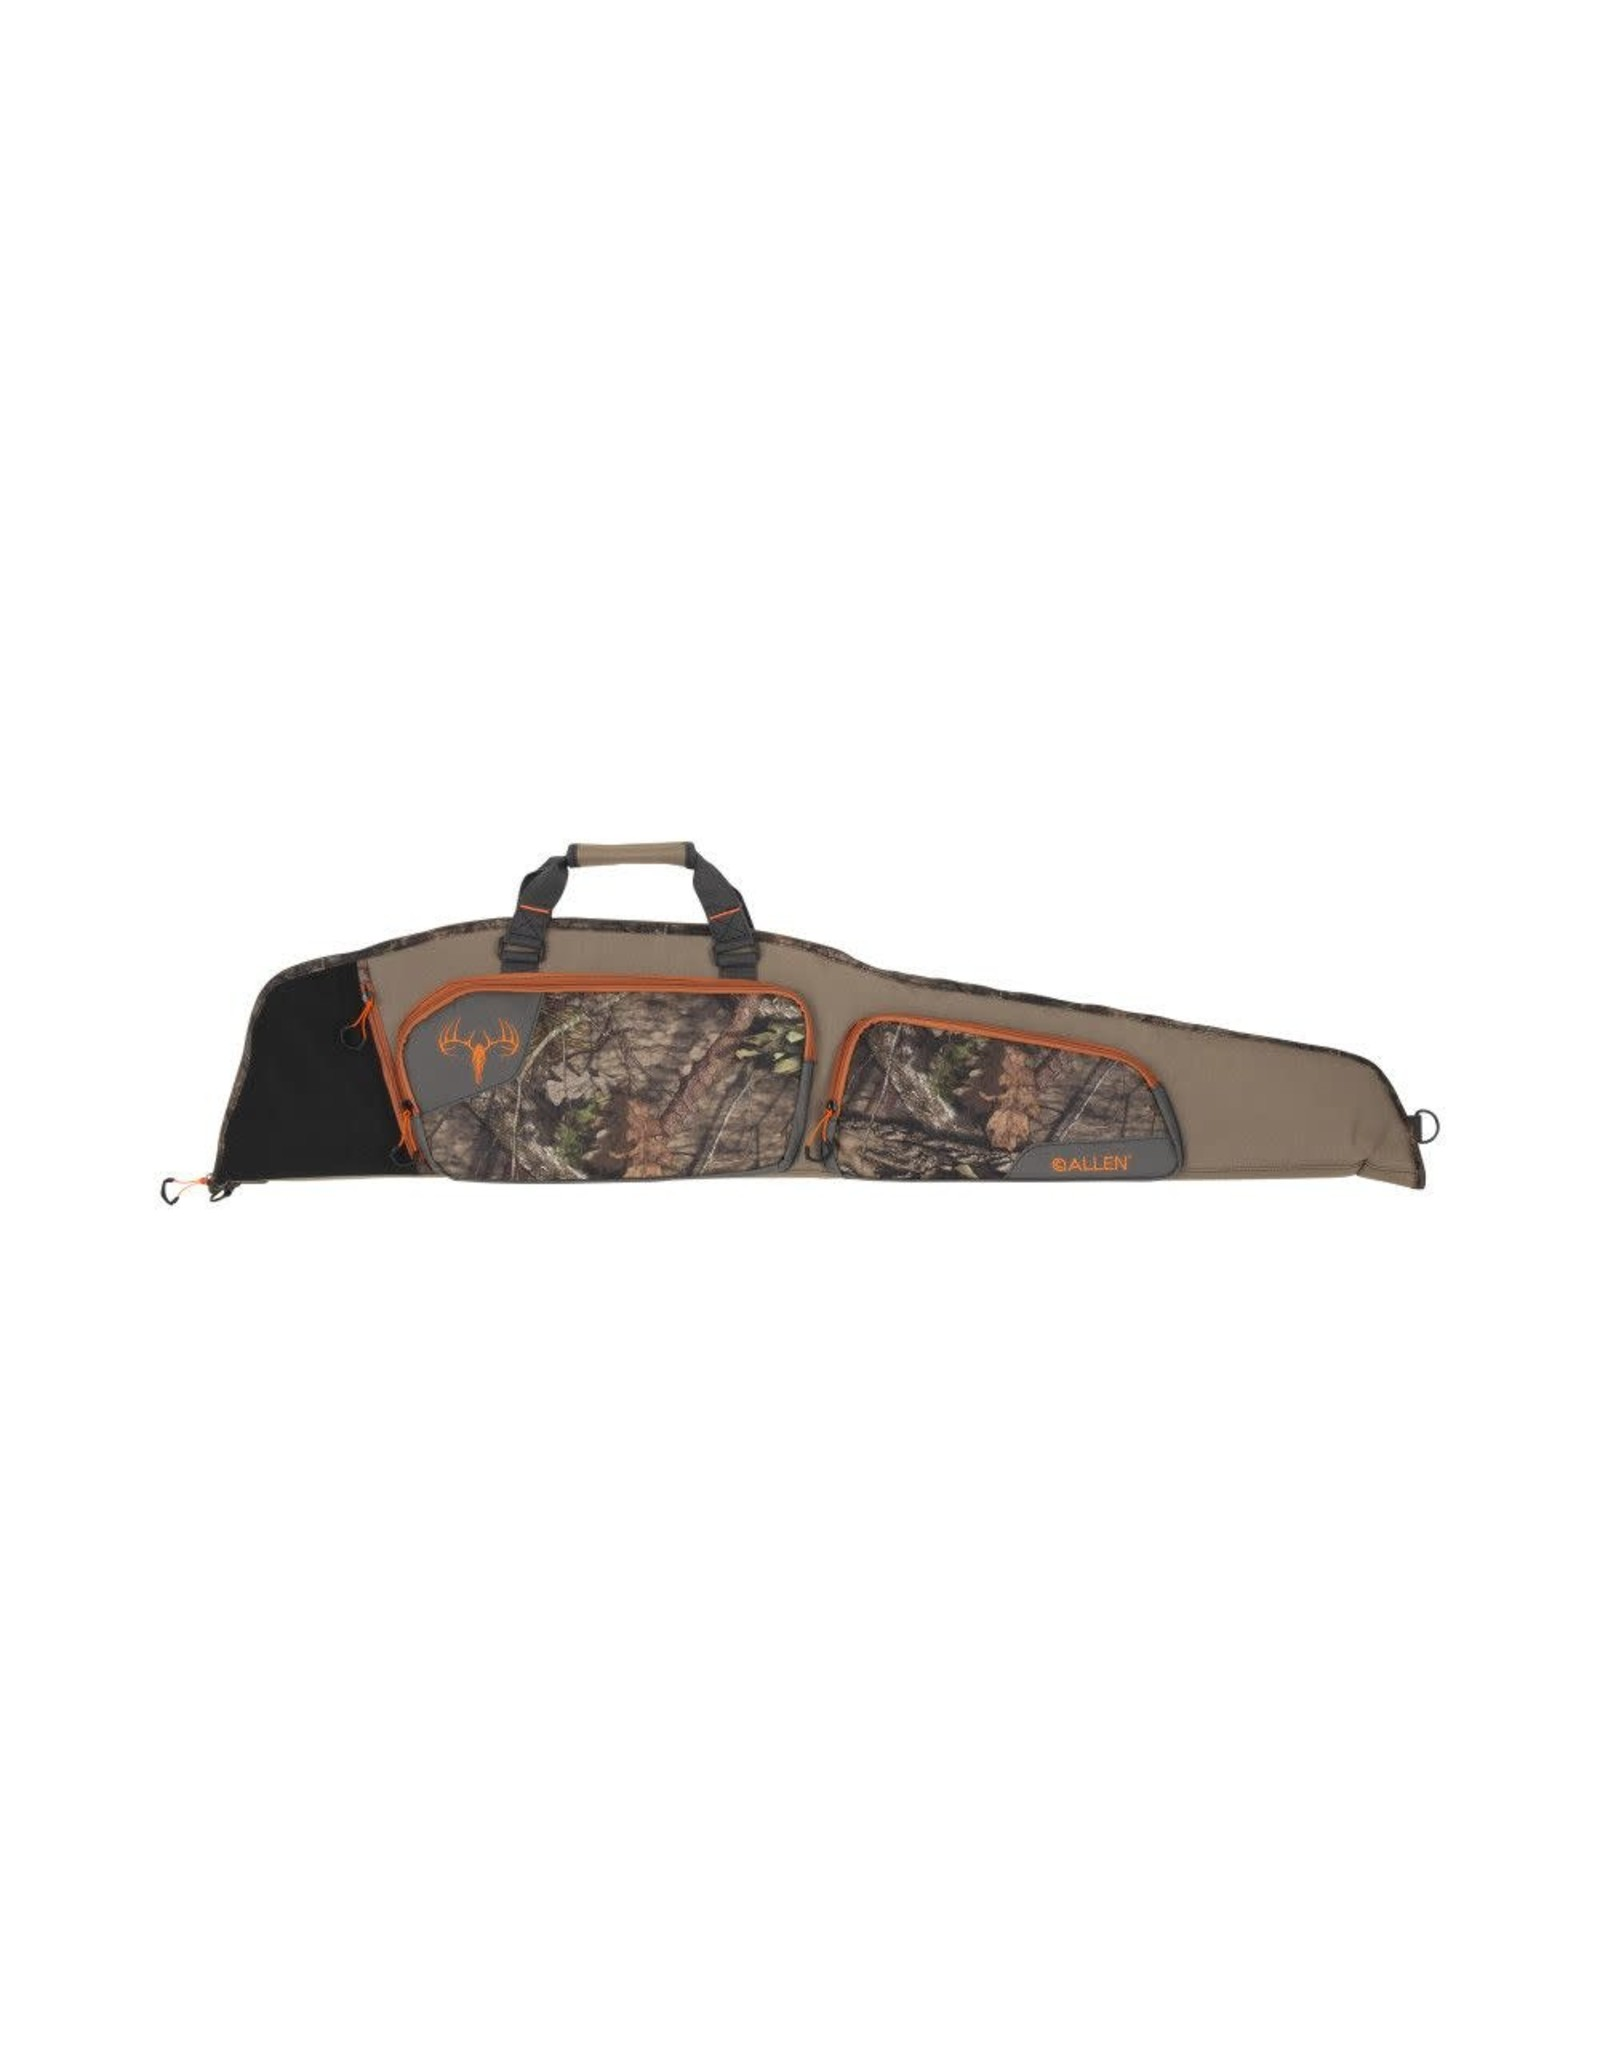 "ALLEN COMPANY Allen Company 46"" Summit Rifle Case, Orange/Mossy Oak Break-Up Country Camo"